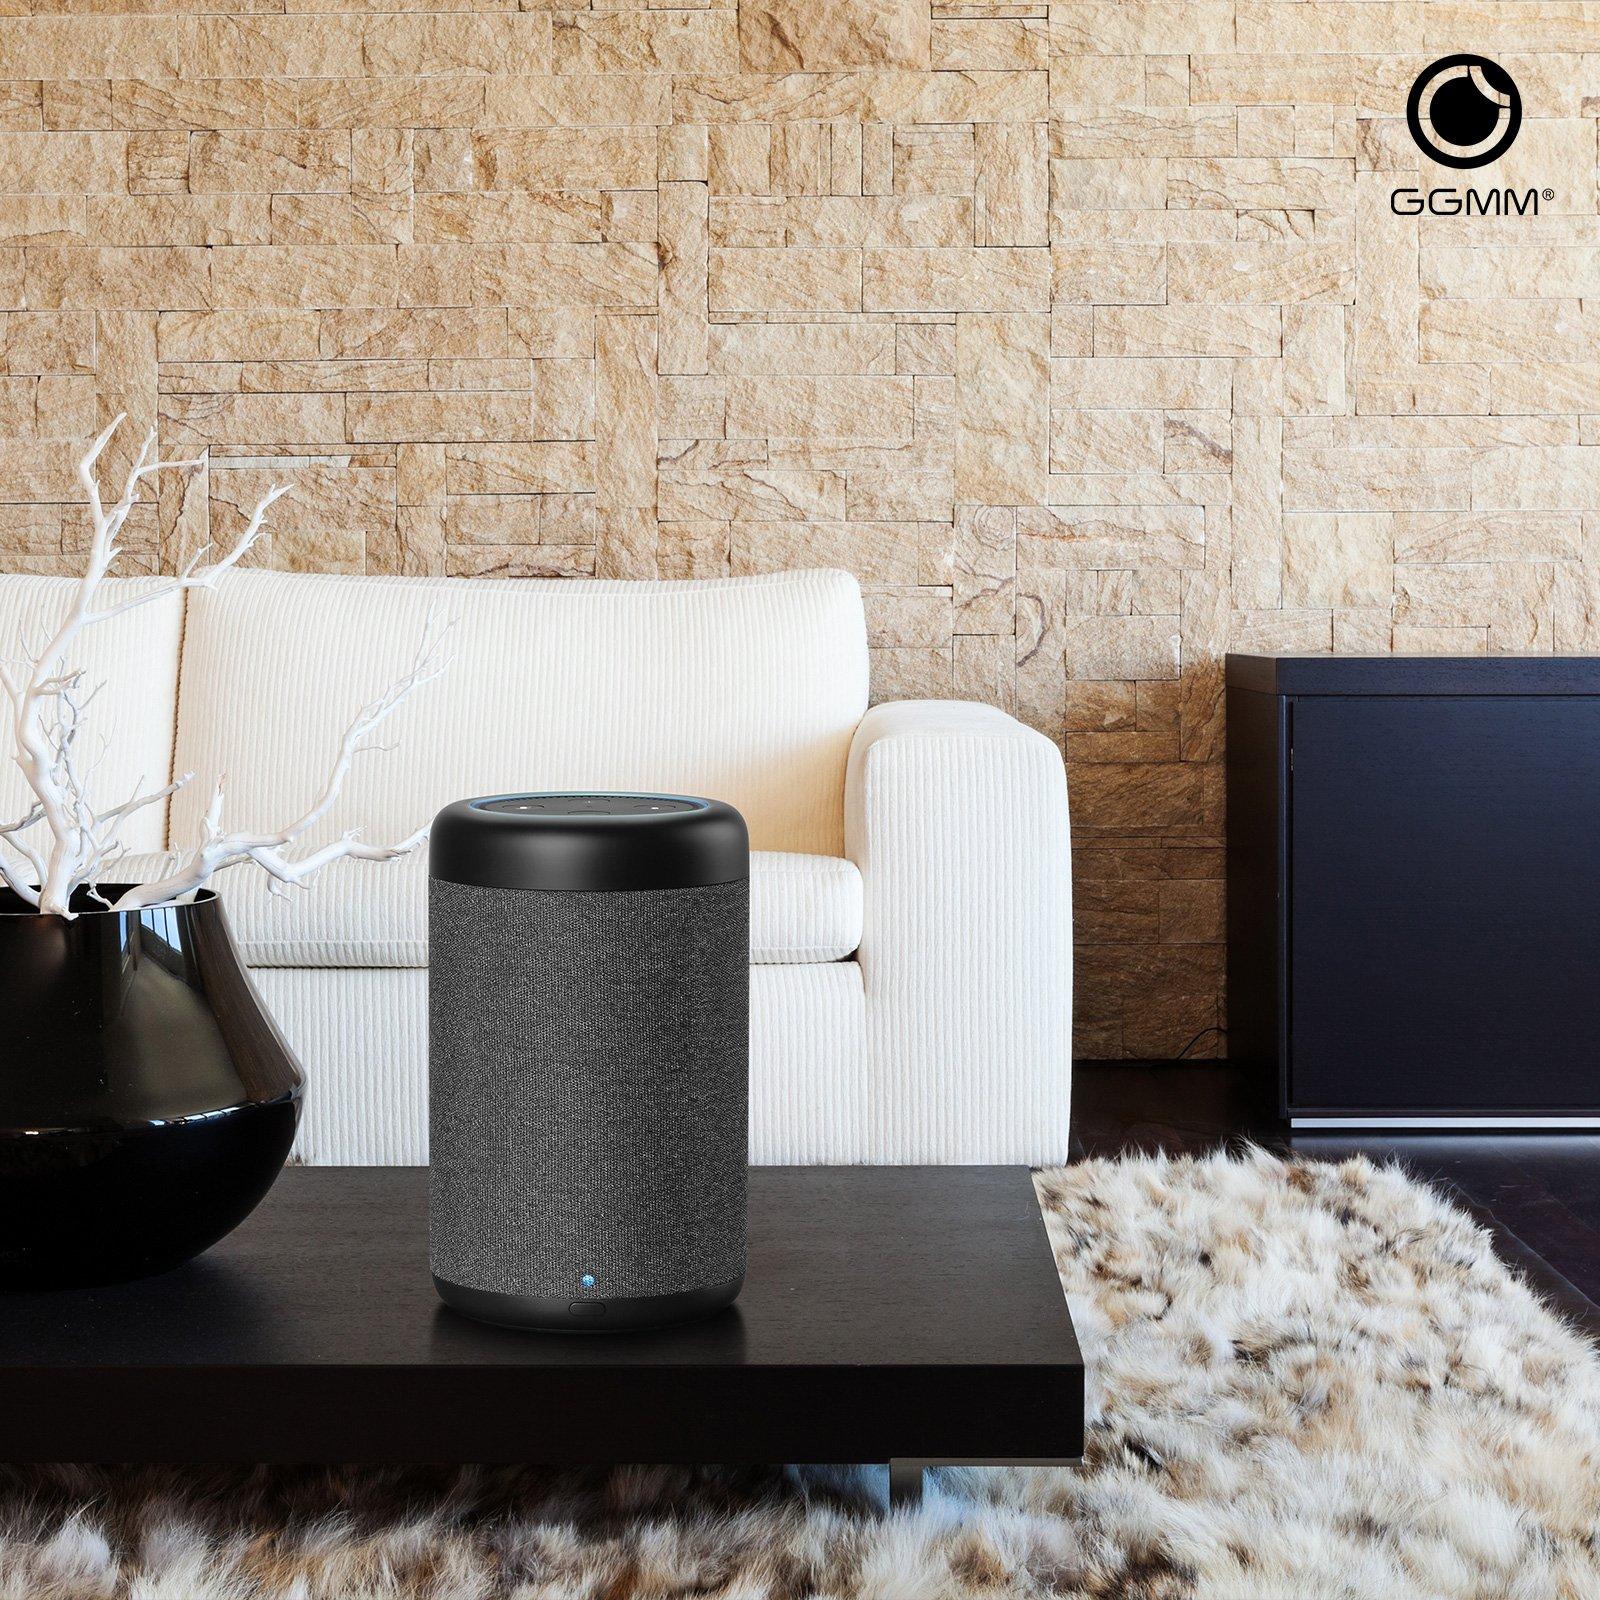 GGMM D6 Portable Speaker for Amazon Echo Dot 2nd Generation, 20W Powerful True 360 Alexa Speakers (DOT SOLD SEPARATELY) by GGMM (Image #8)